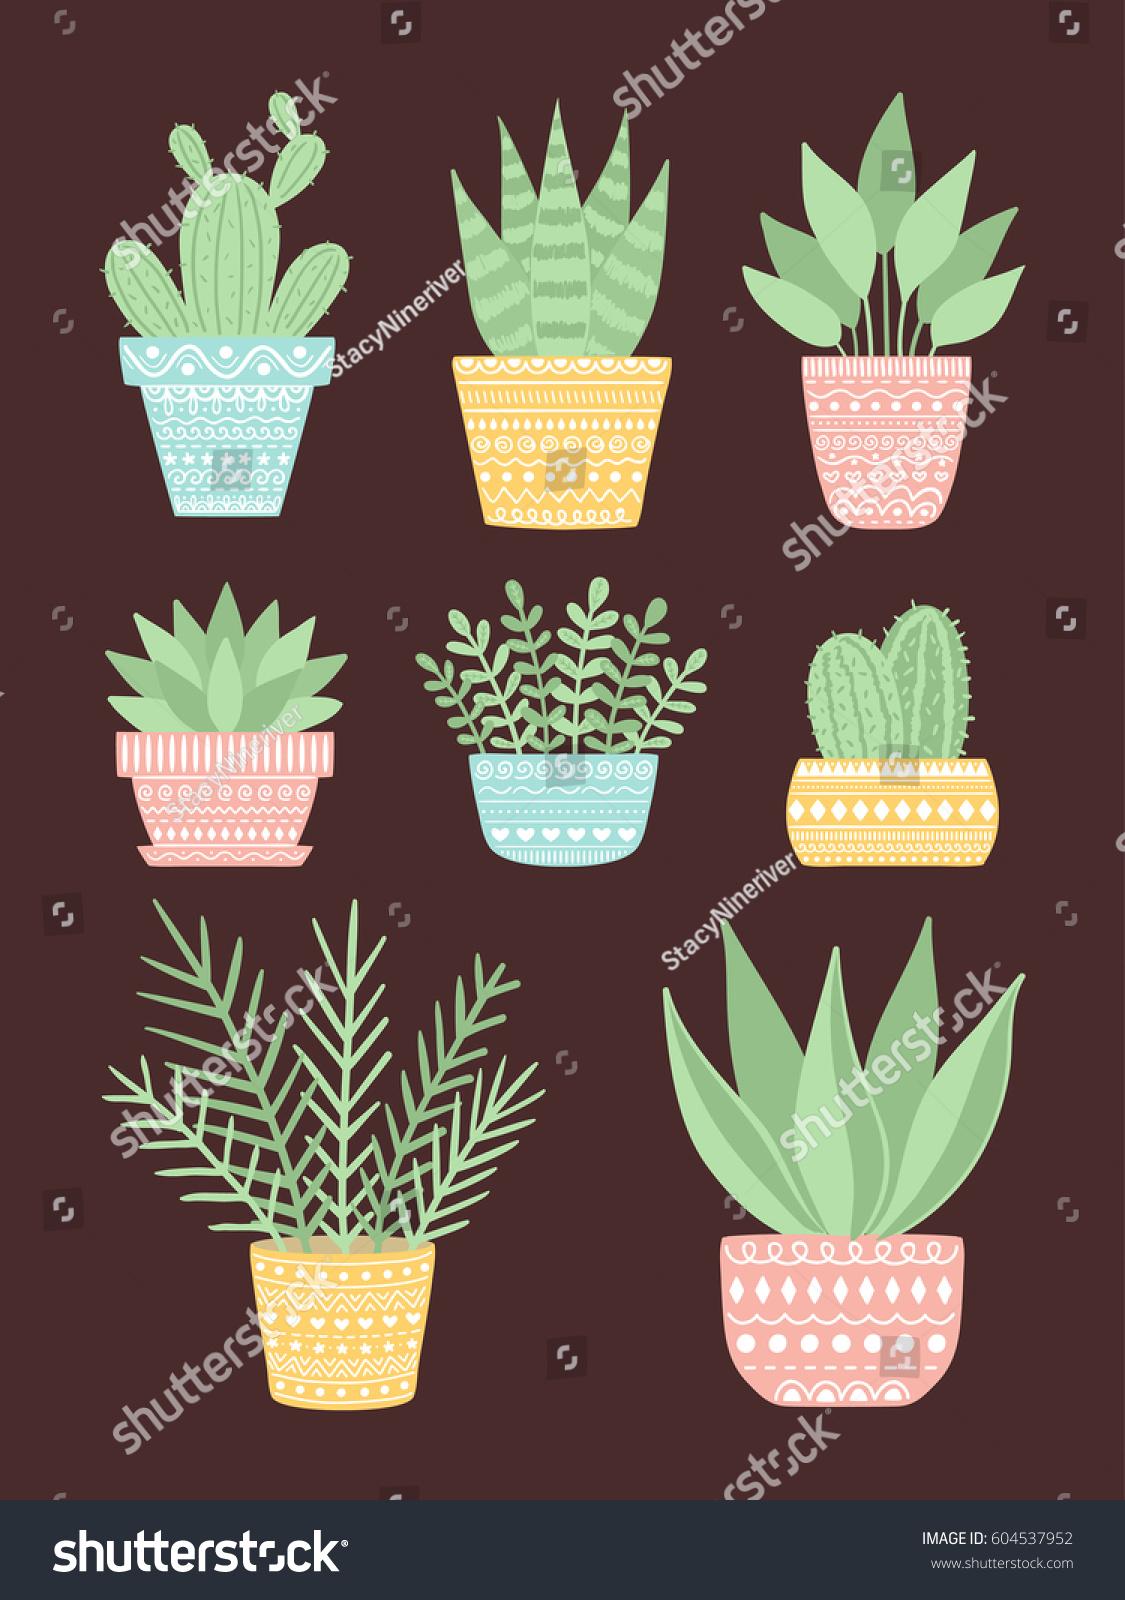 hand decorative cute pots decor stock handdraw vector hd royalty image illustration in draw plants